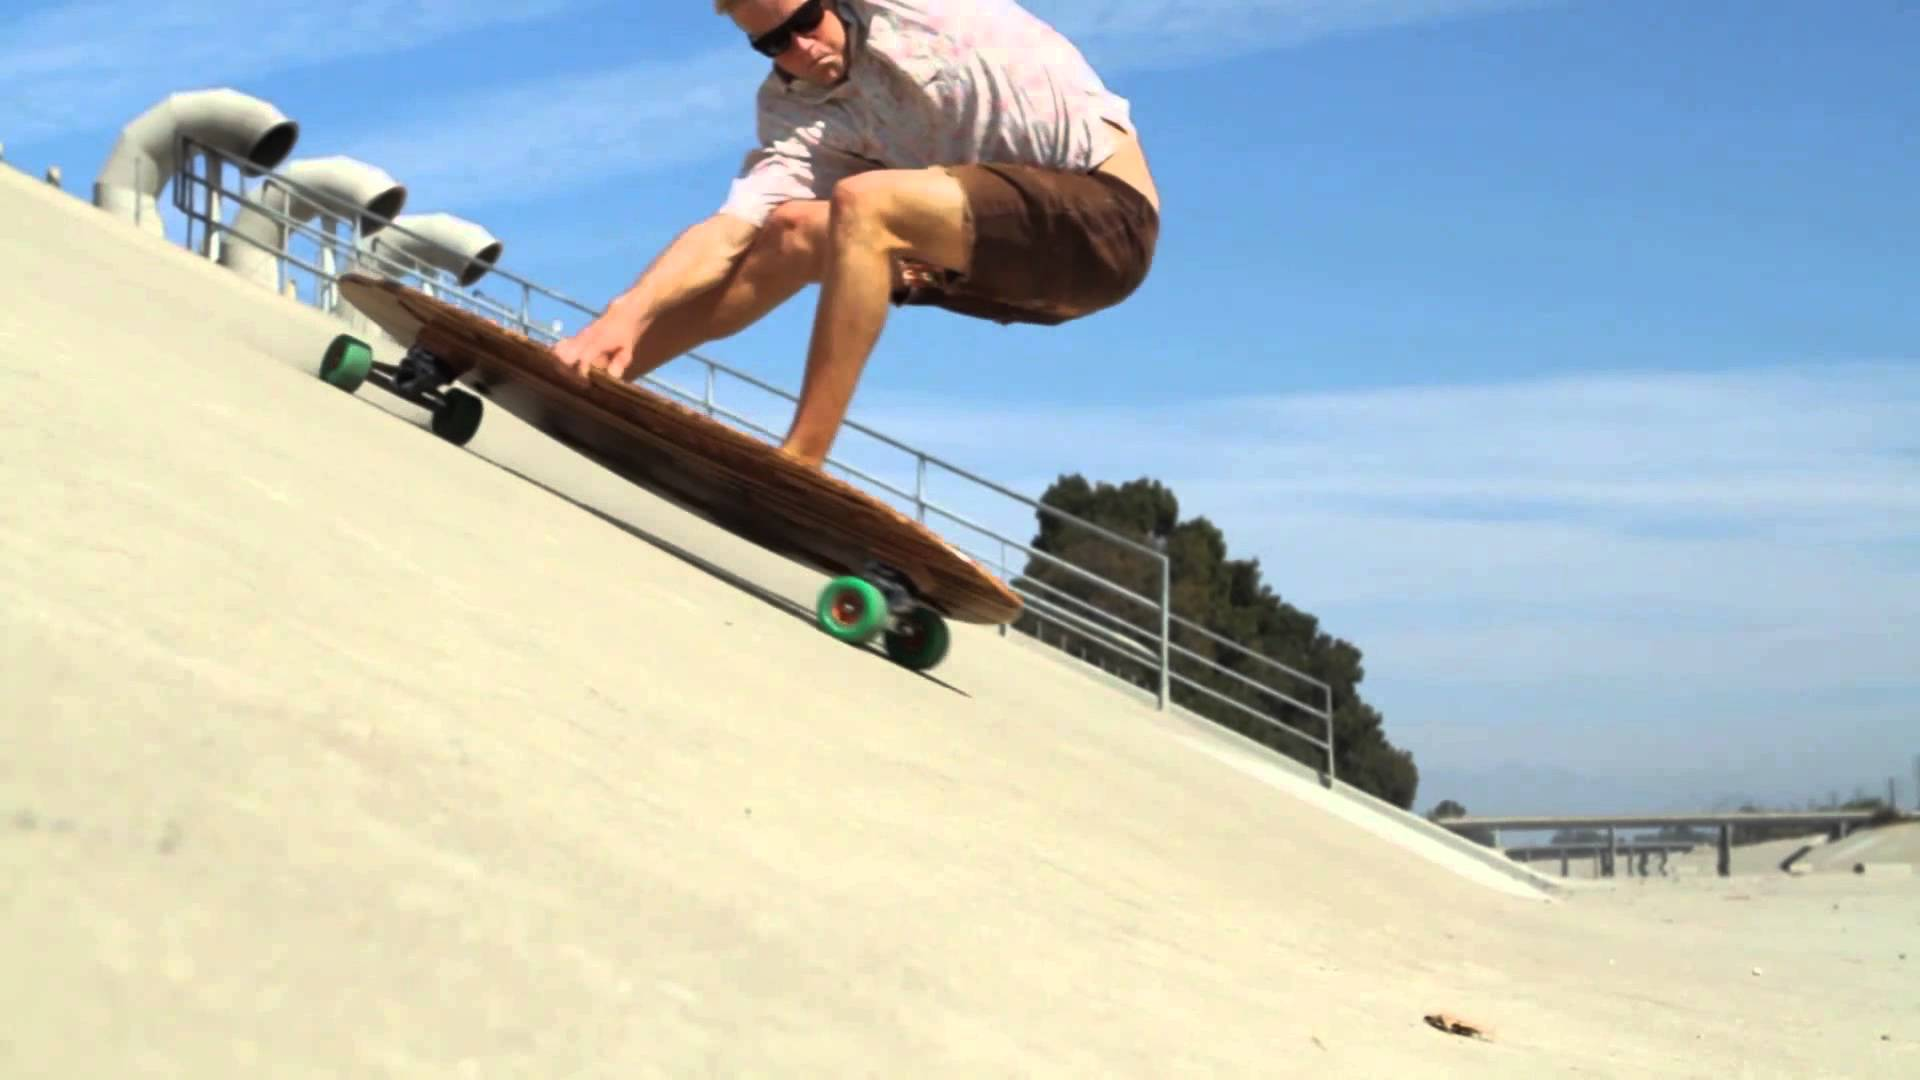 Hamboards-brand-new-longboard-the-Pinger.jpg